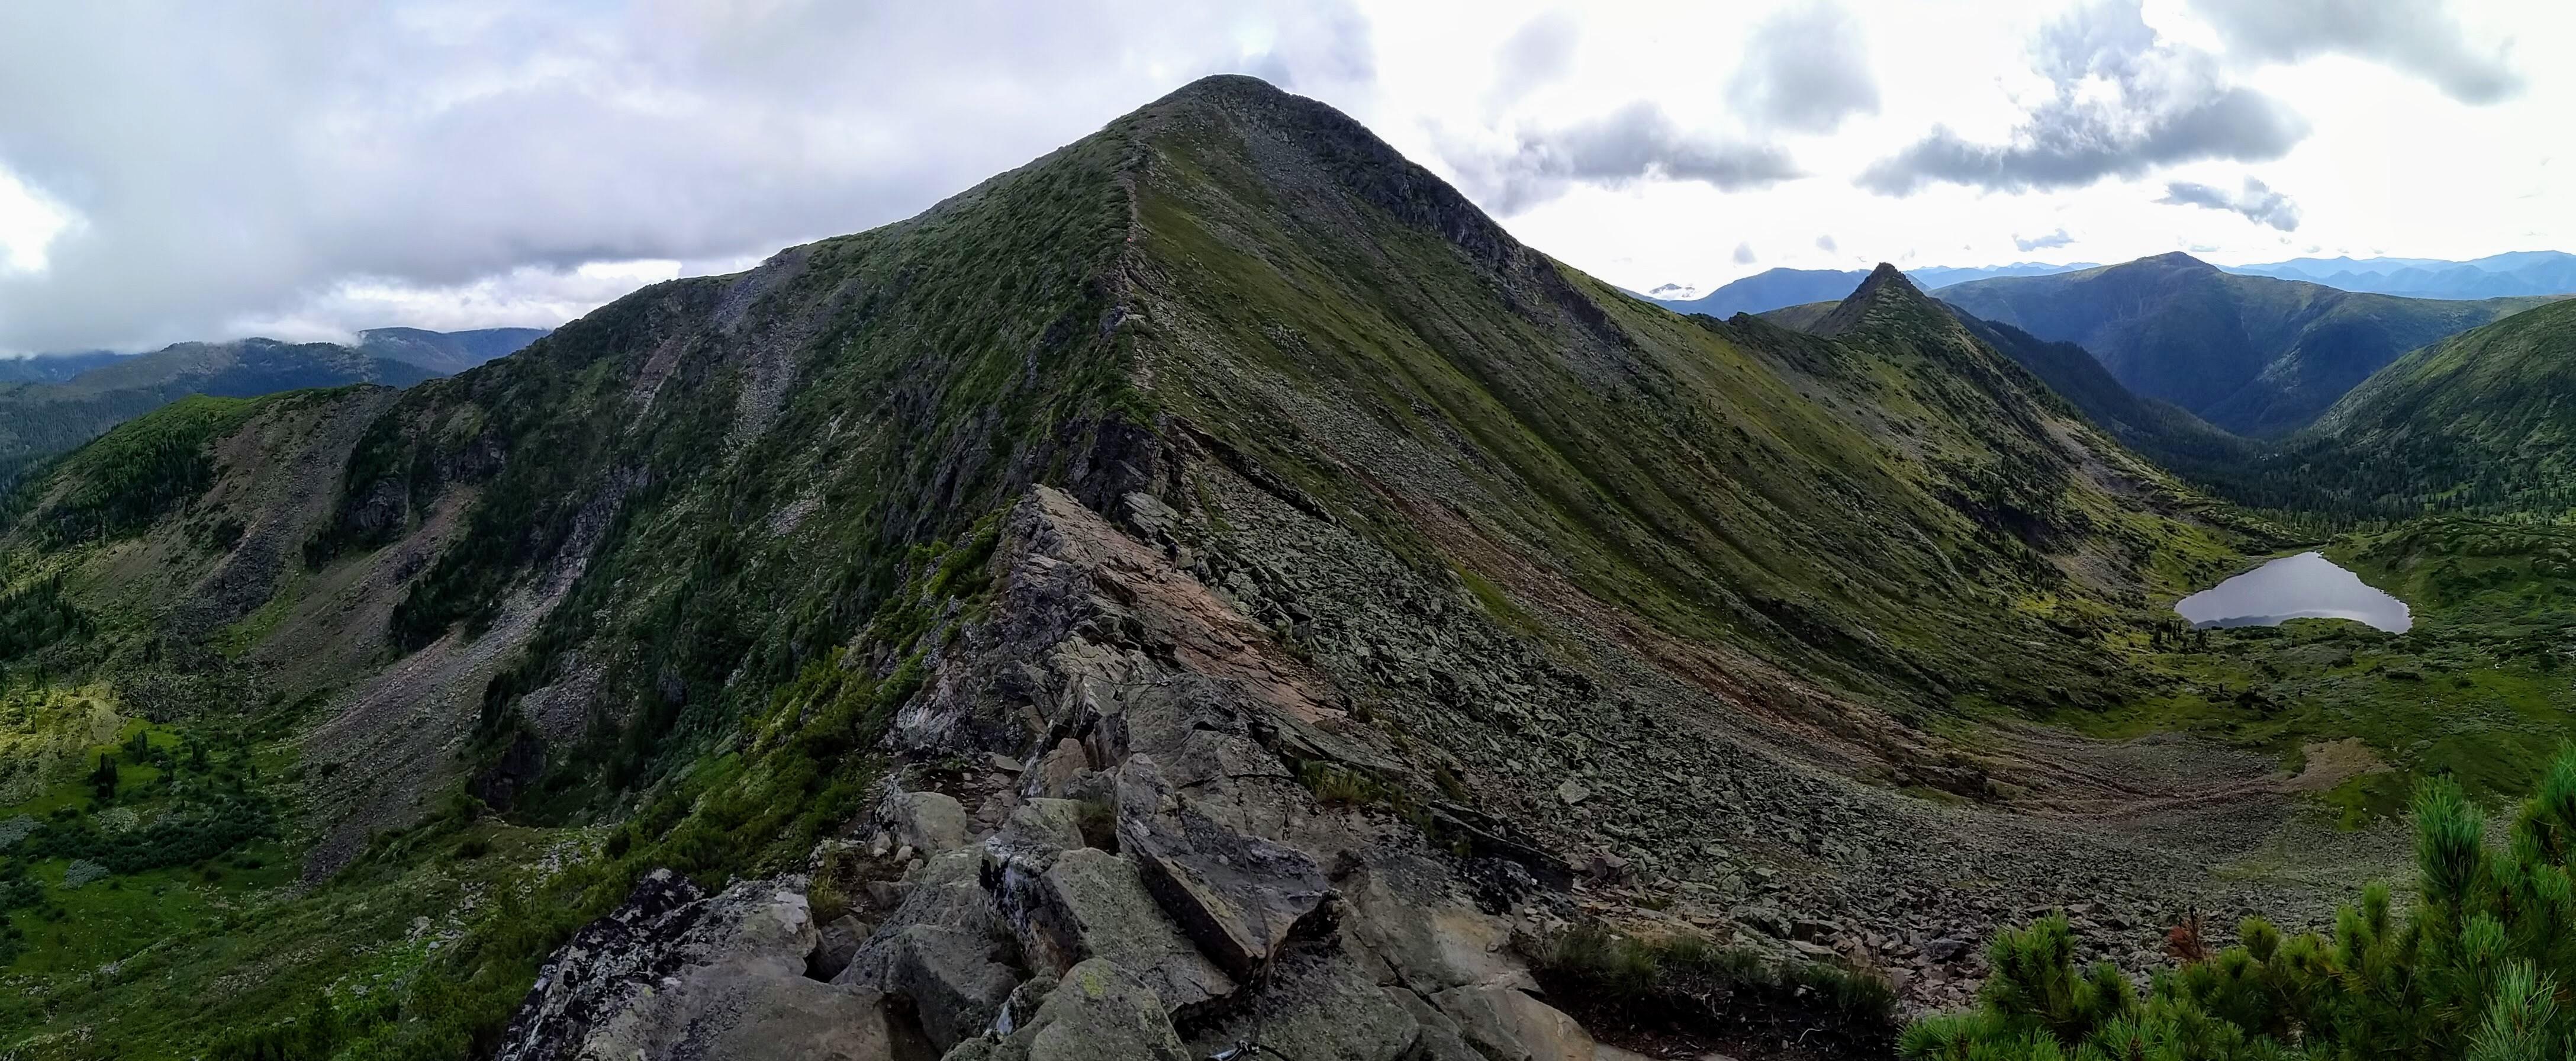 Chersky peak